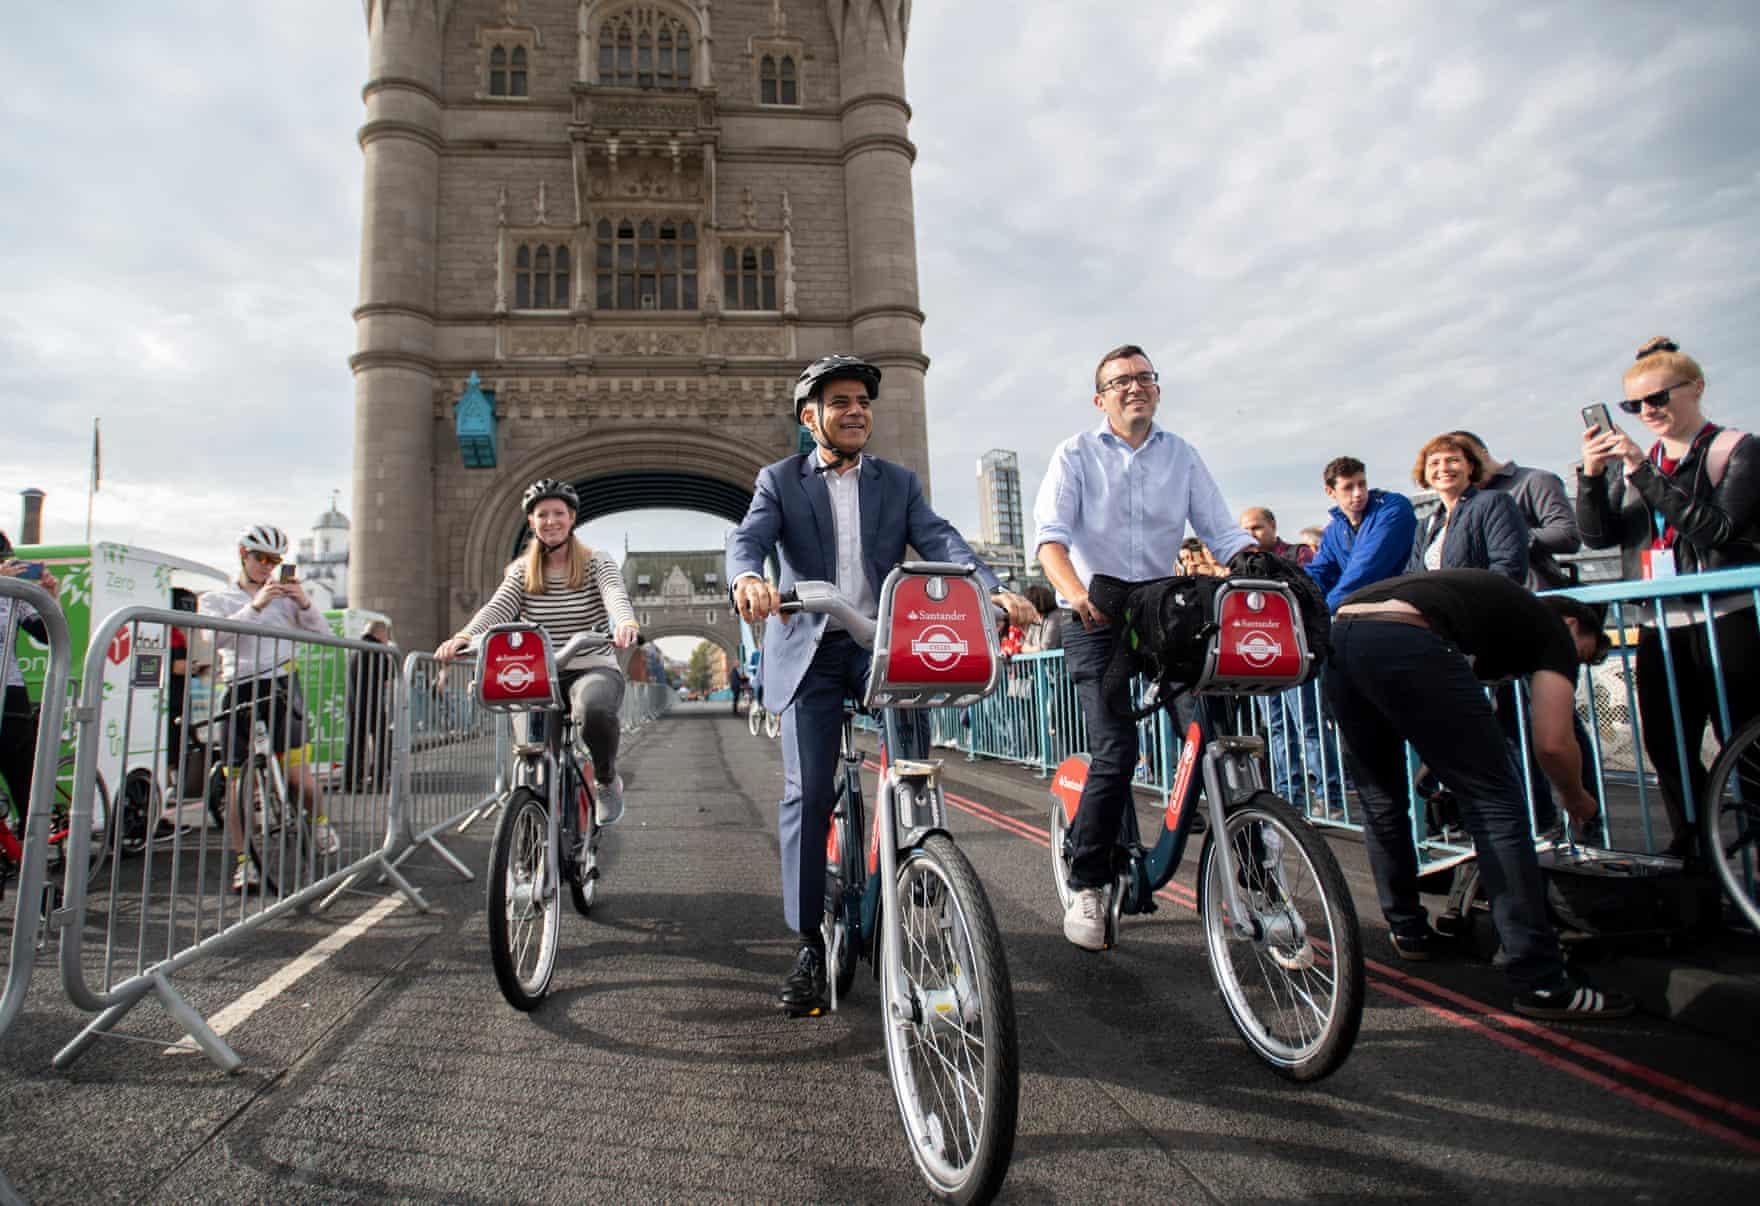 London's Tower Bridge on car-free day 2019 (photo credit  theguardian.com.uk )